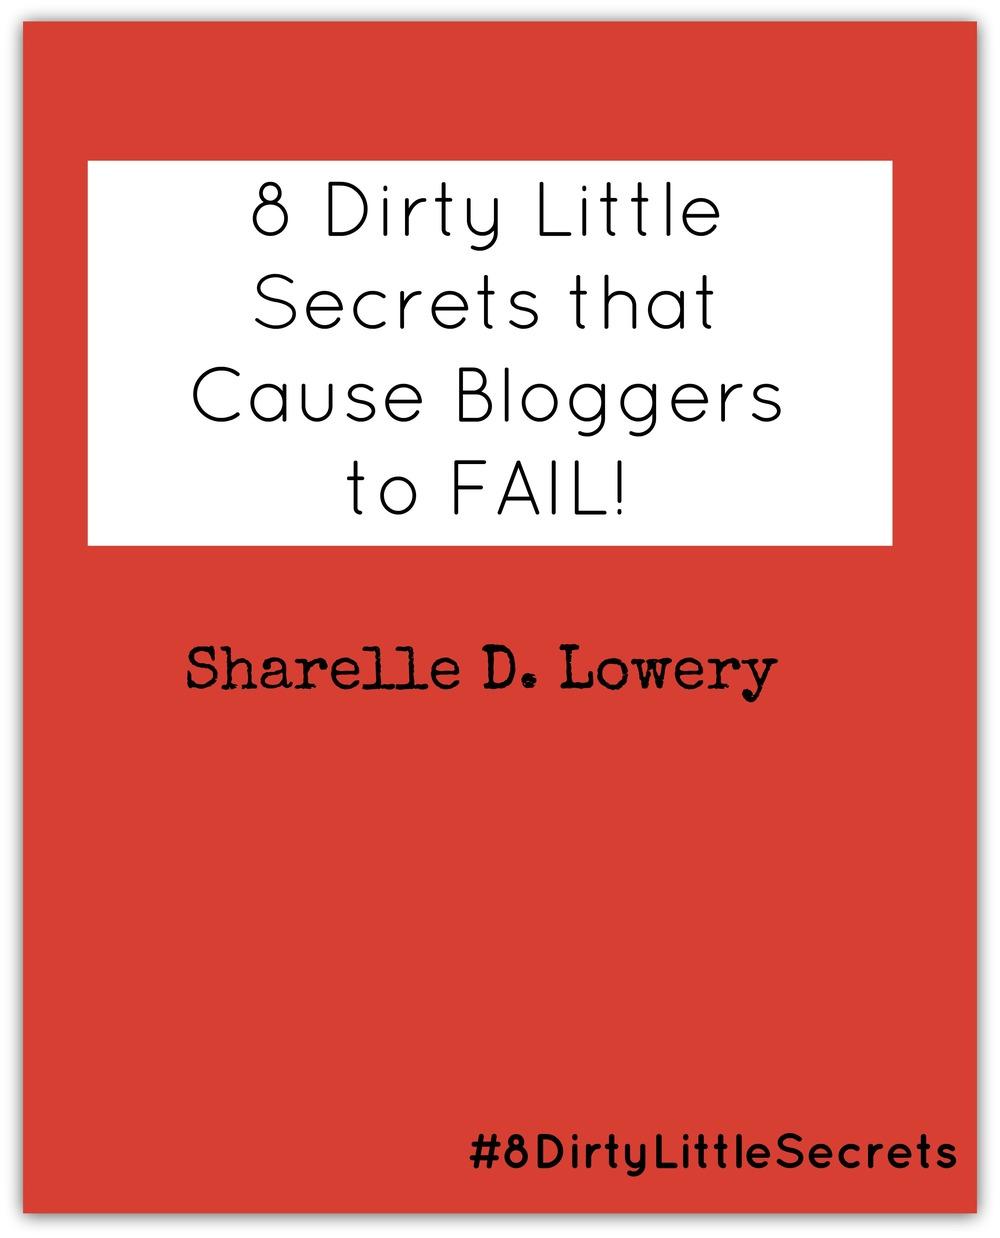 8 Dirty Little Secrets.jpg